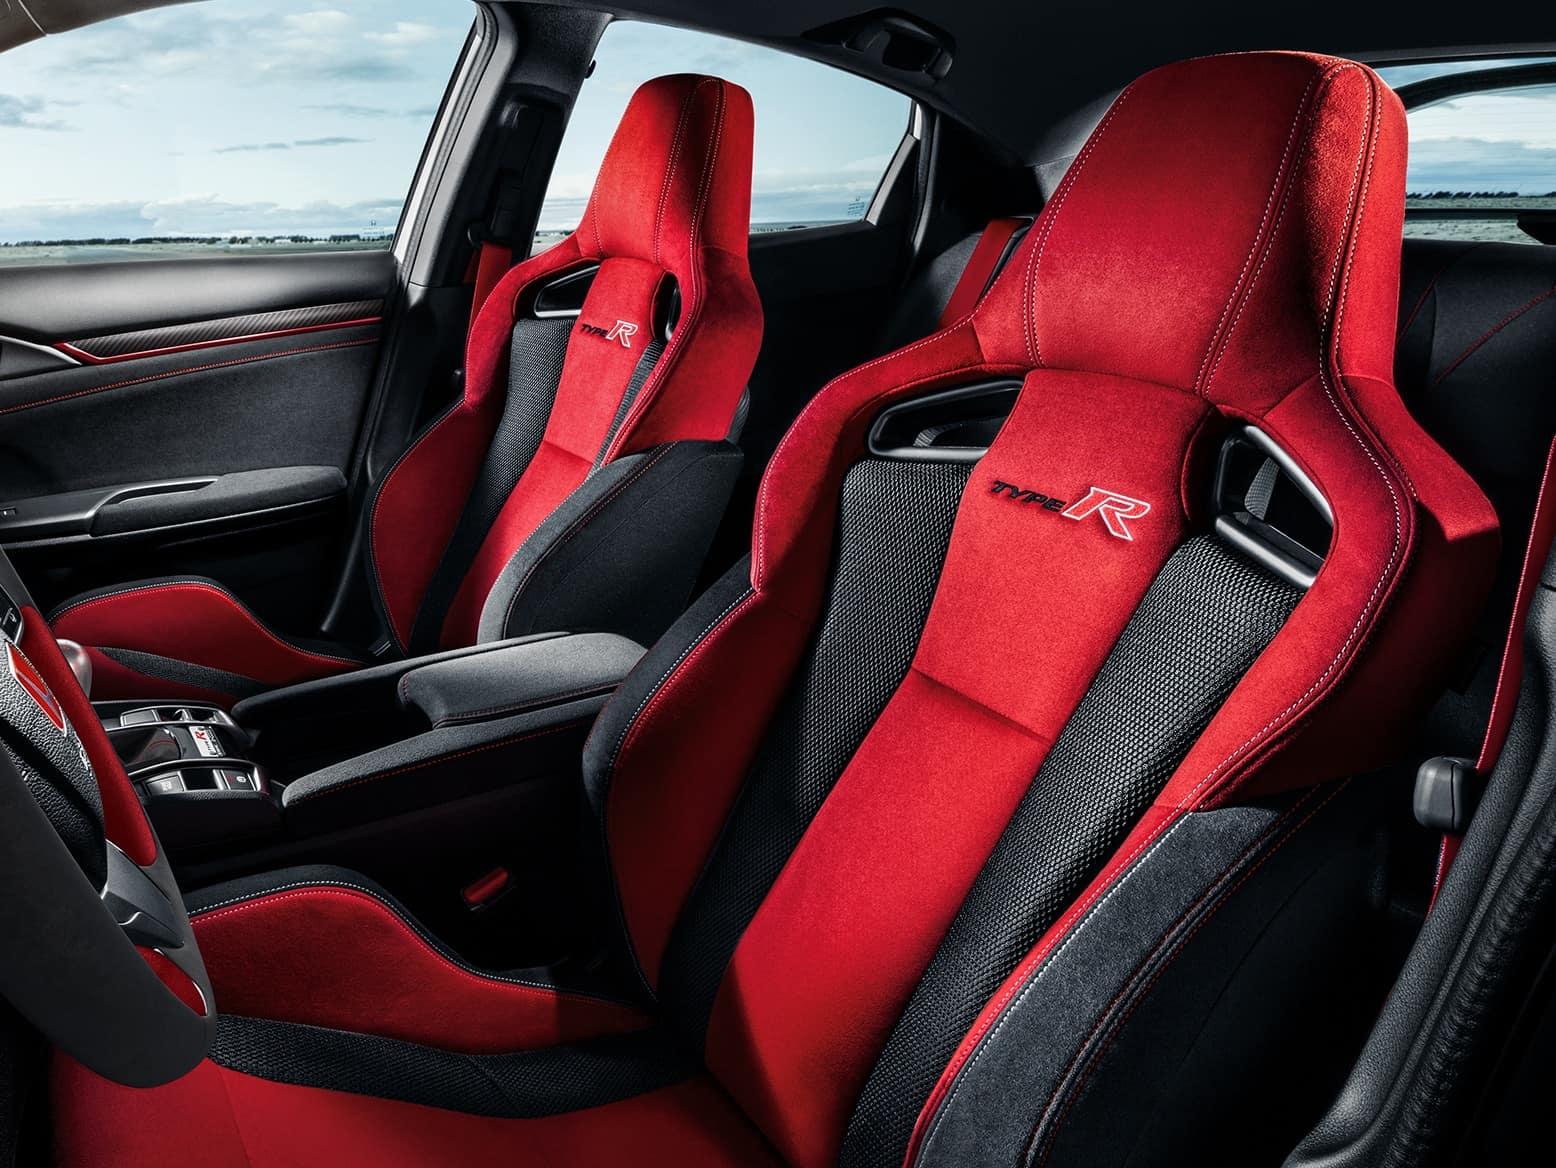 2021 Honda Civic Type R with sport seats